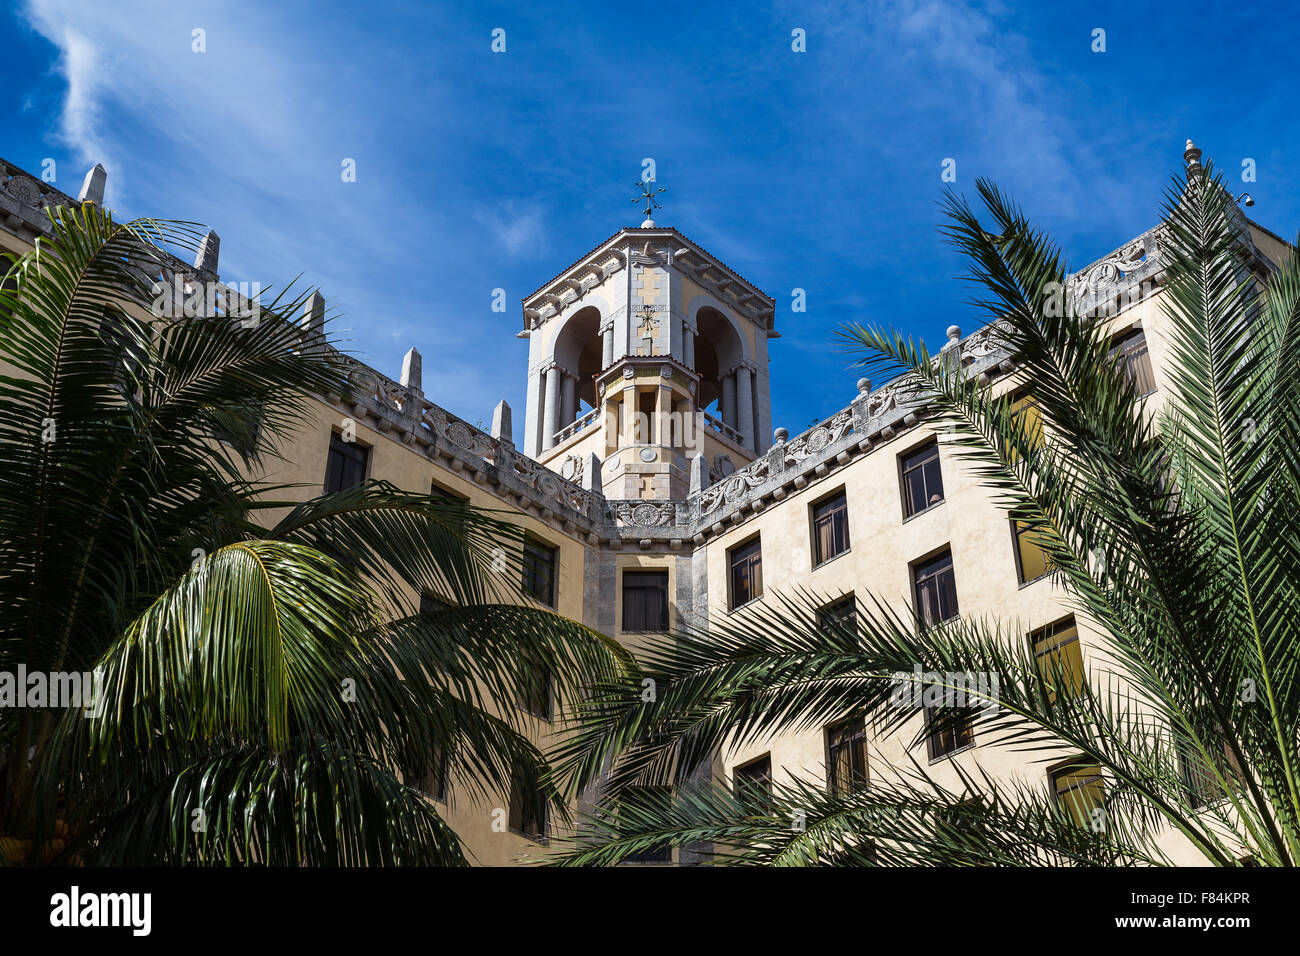 Hotel Nacional de Cuba (tower) - Stock Image